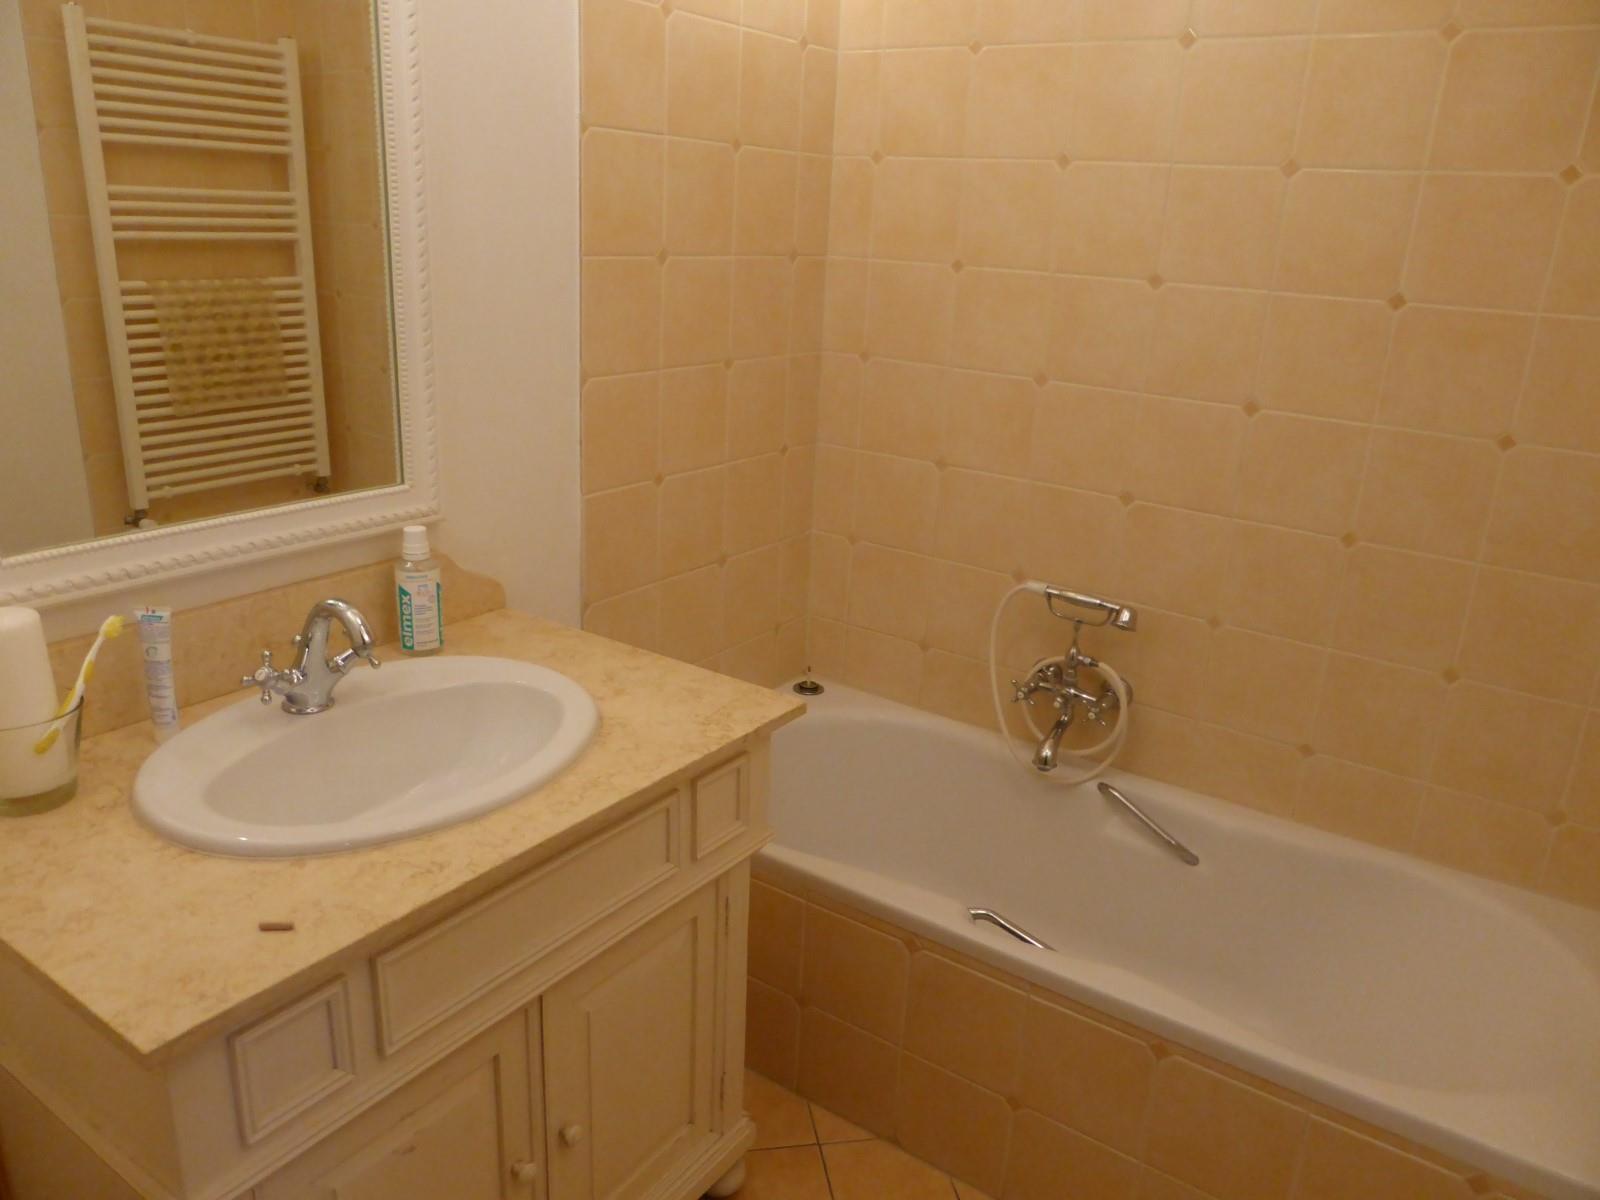 Appartement exceptionnel - Woluwe-Saint-Pierre - #2927607-9